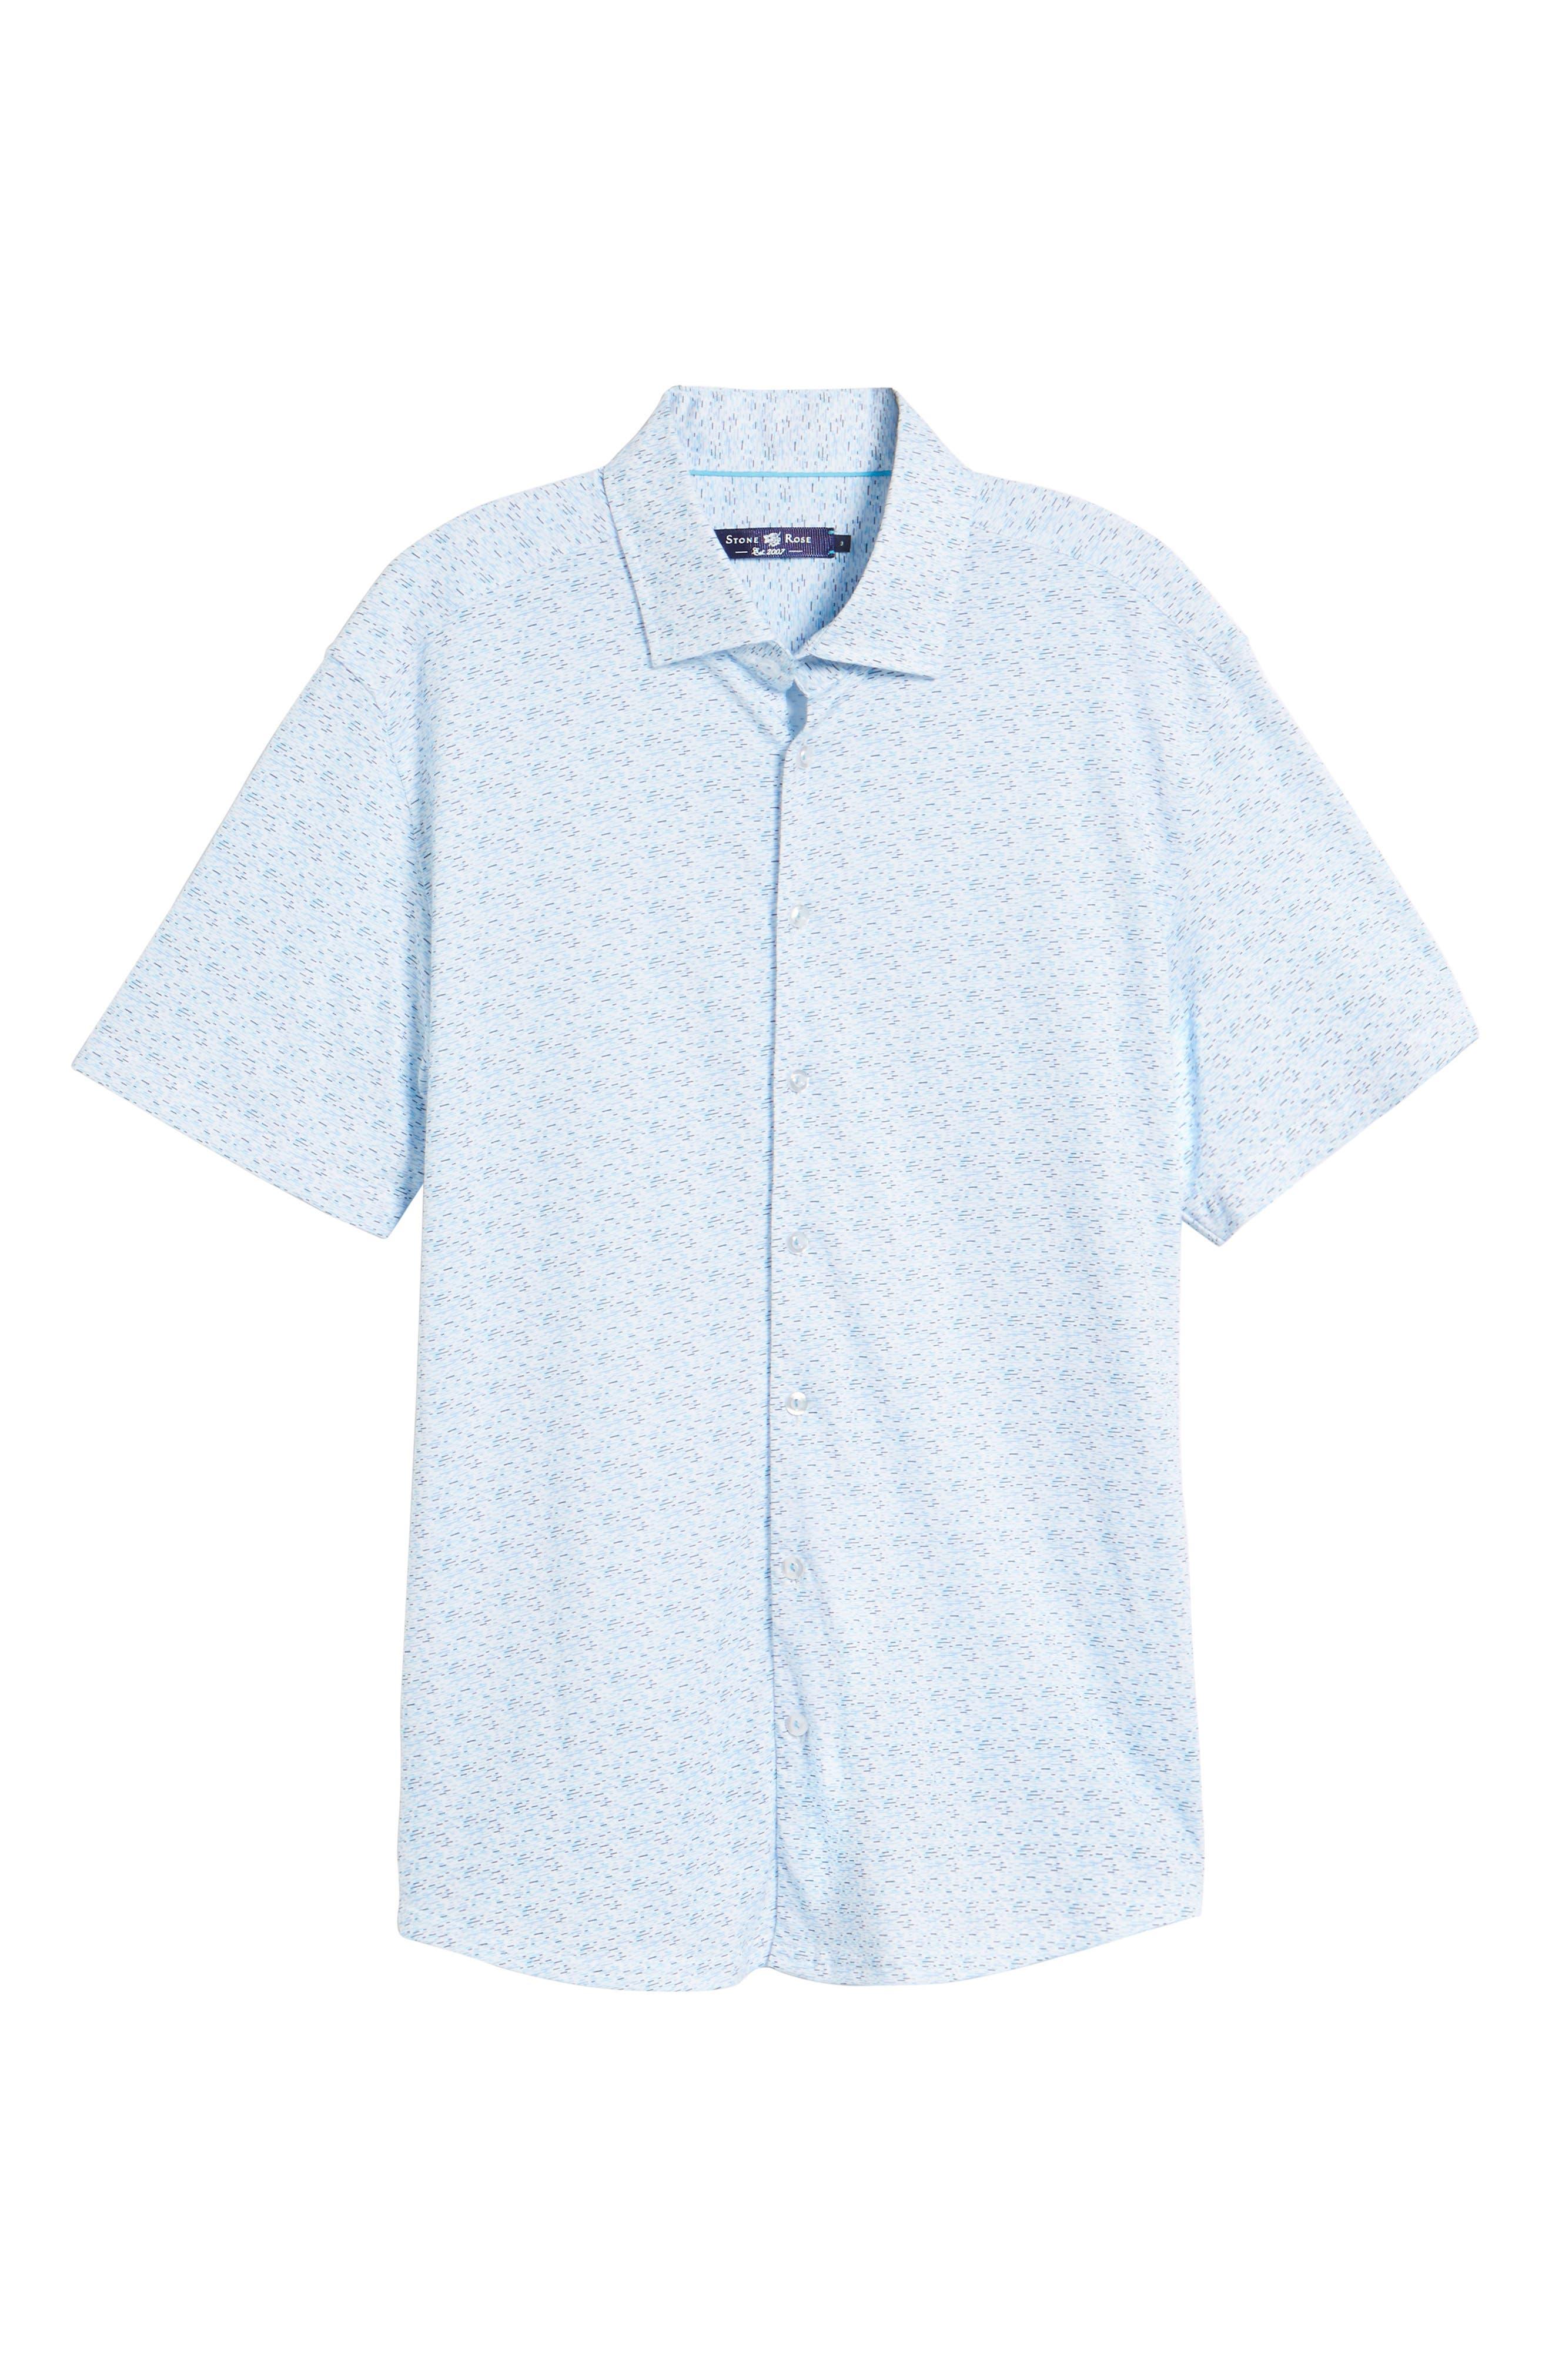 Knit Sport Shirt,                             Alternate thumbnail 6, color,                             Blue